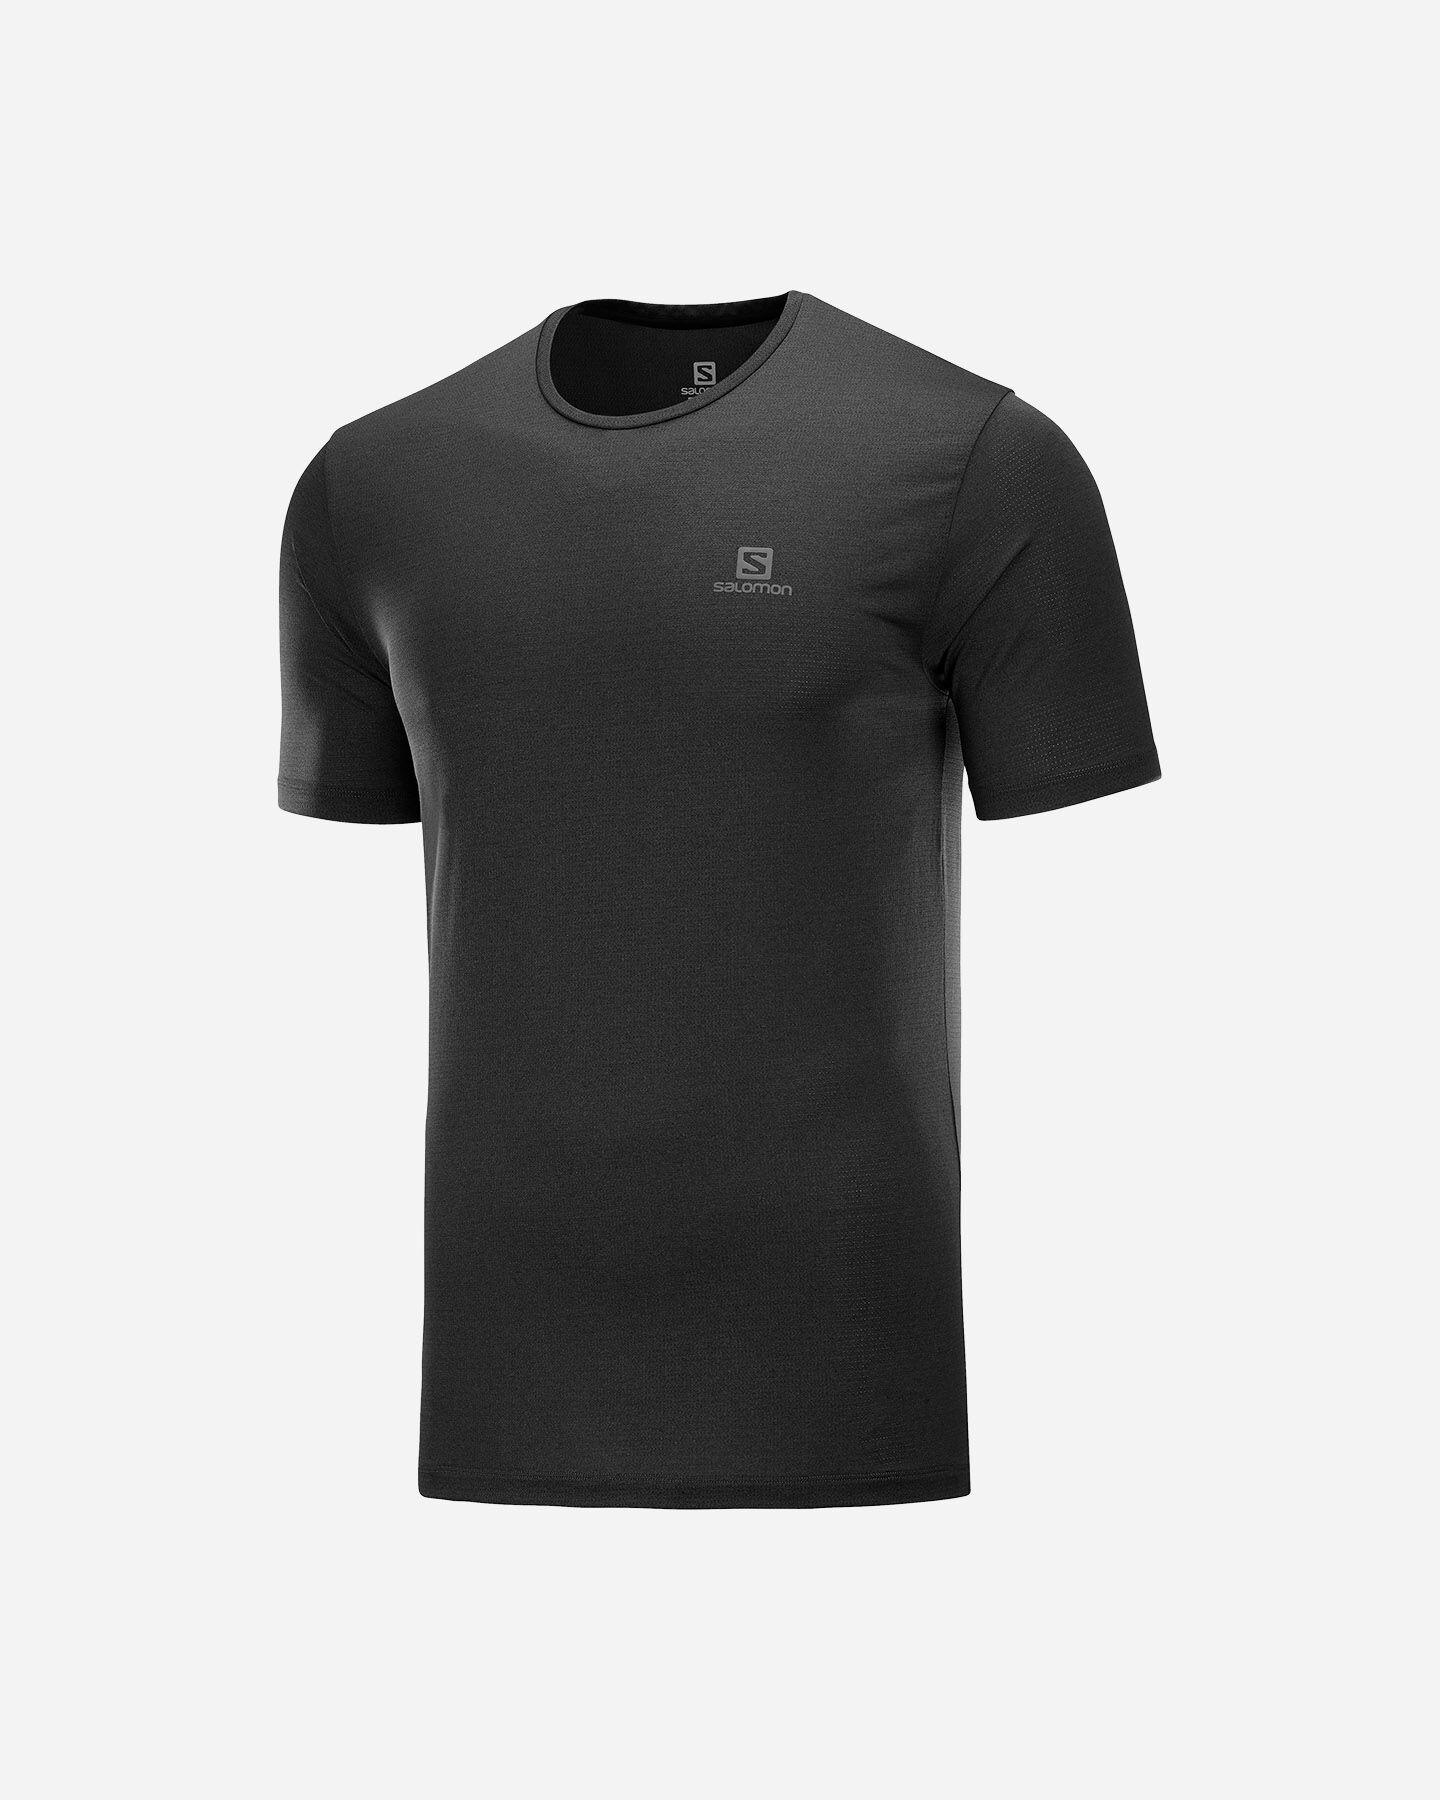 T-Shirt SALOMON AGILE TRAINING M S5173875 scatto 0